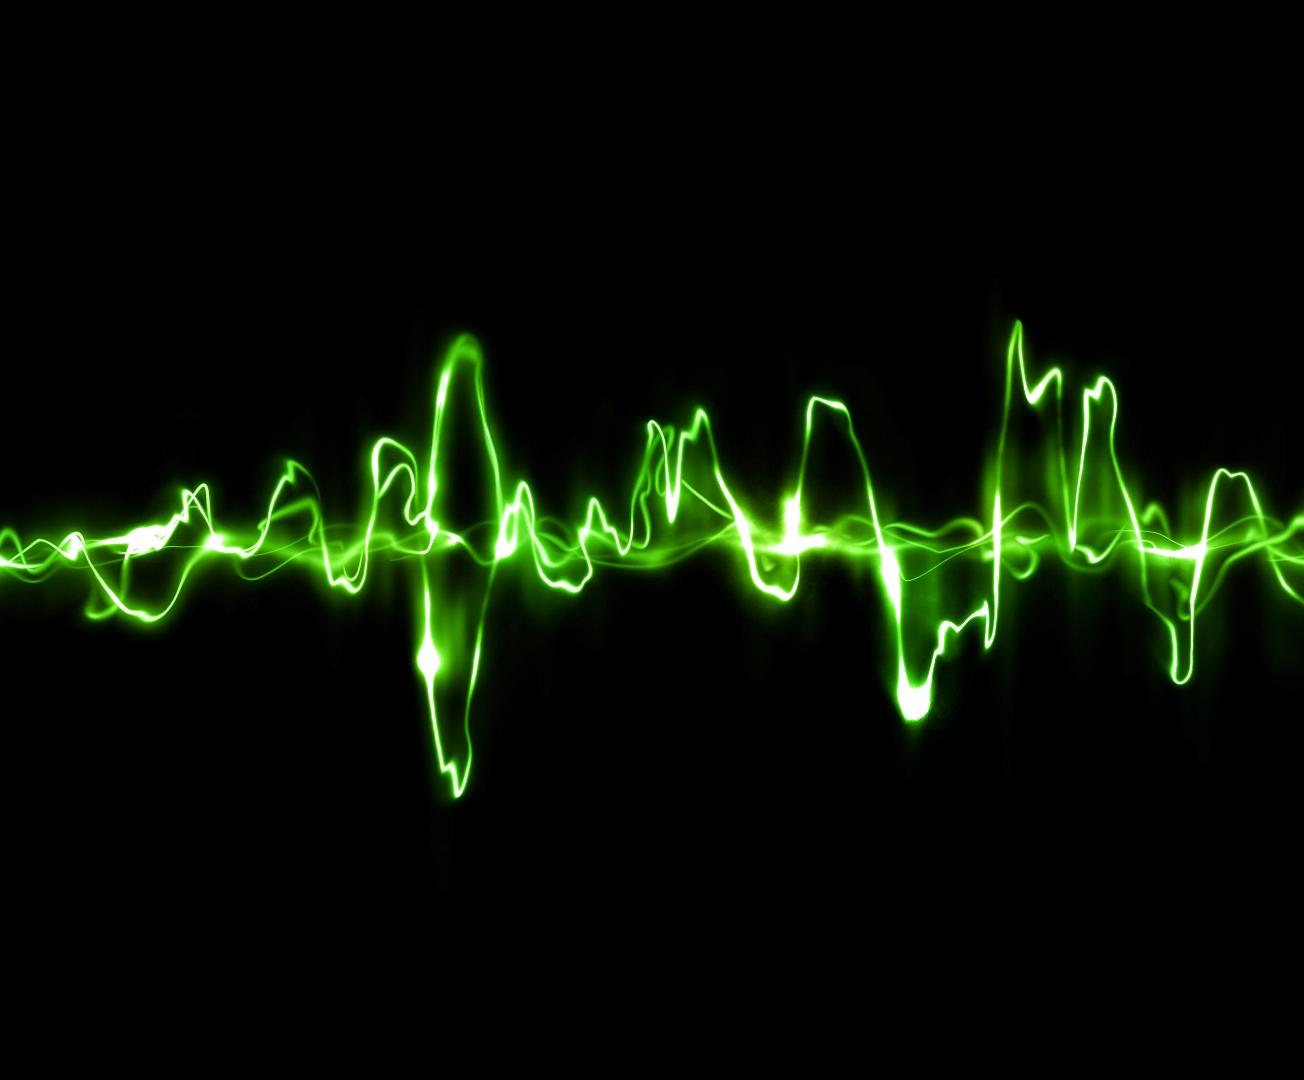 zlab-acustica-laboratorio-analisi-rams-fem-controllo-del-rumore